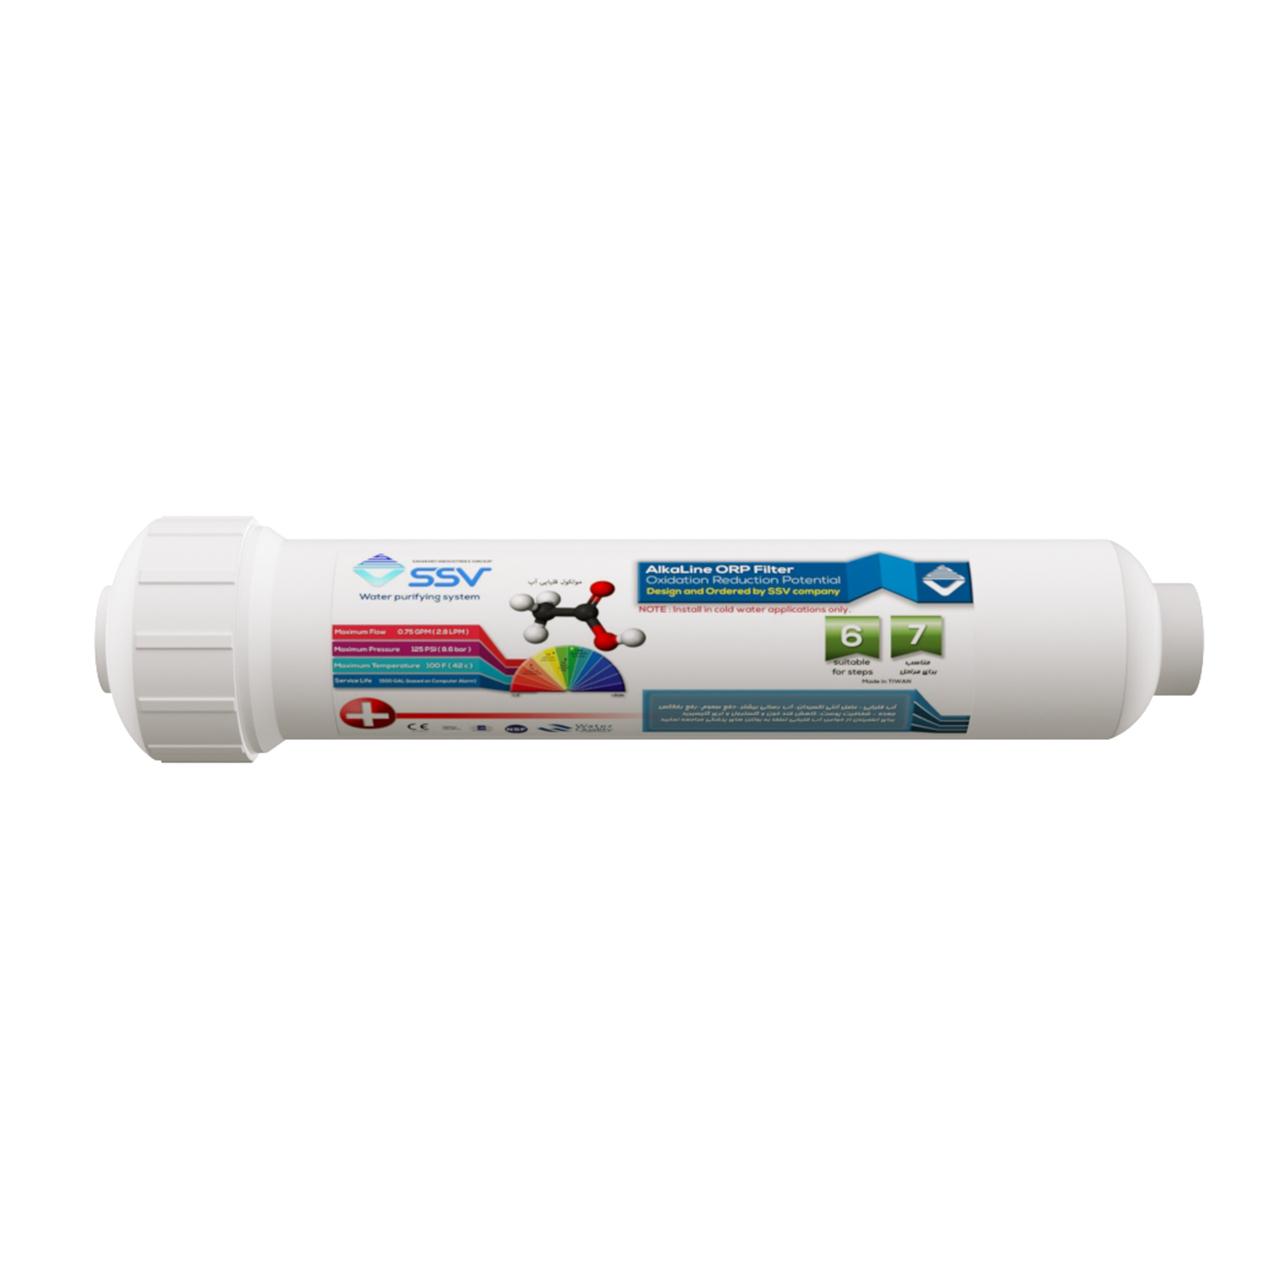 فیلتر دستگاه تصفیه کننده آب اس اس وی مدل Rechargeable Alkaline